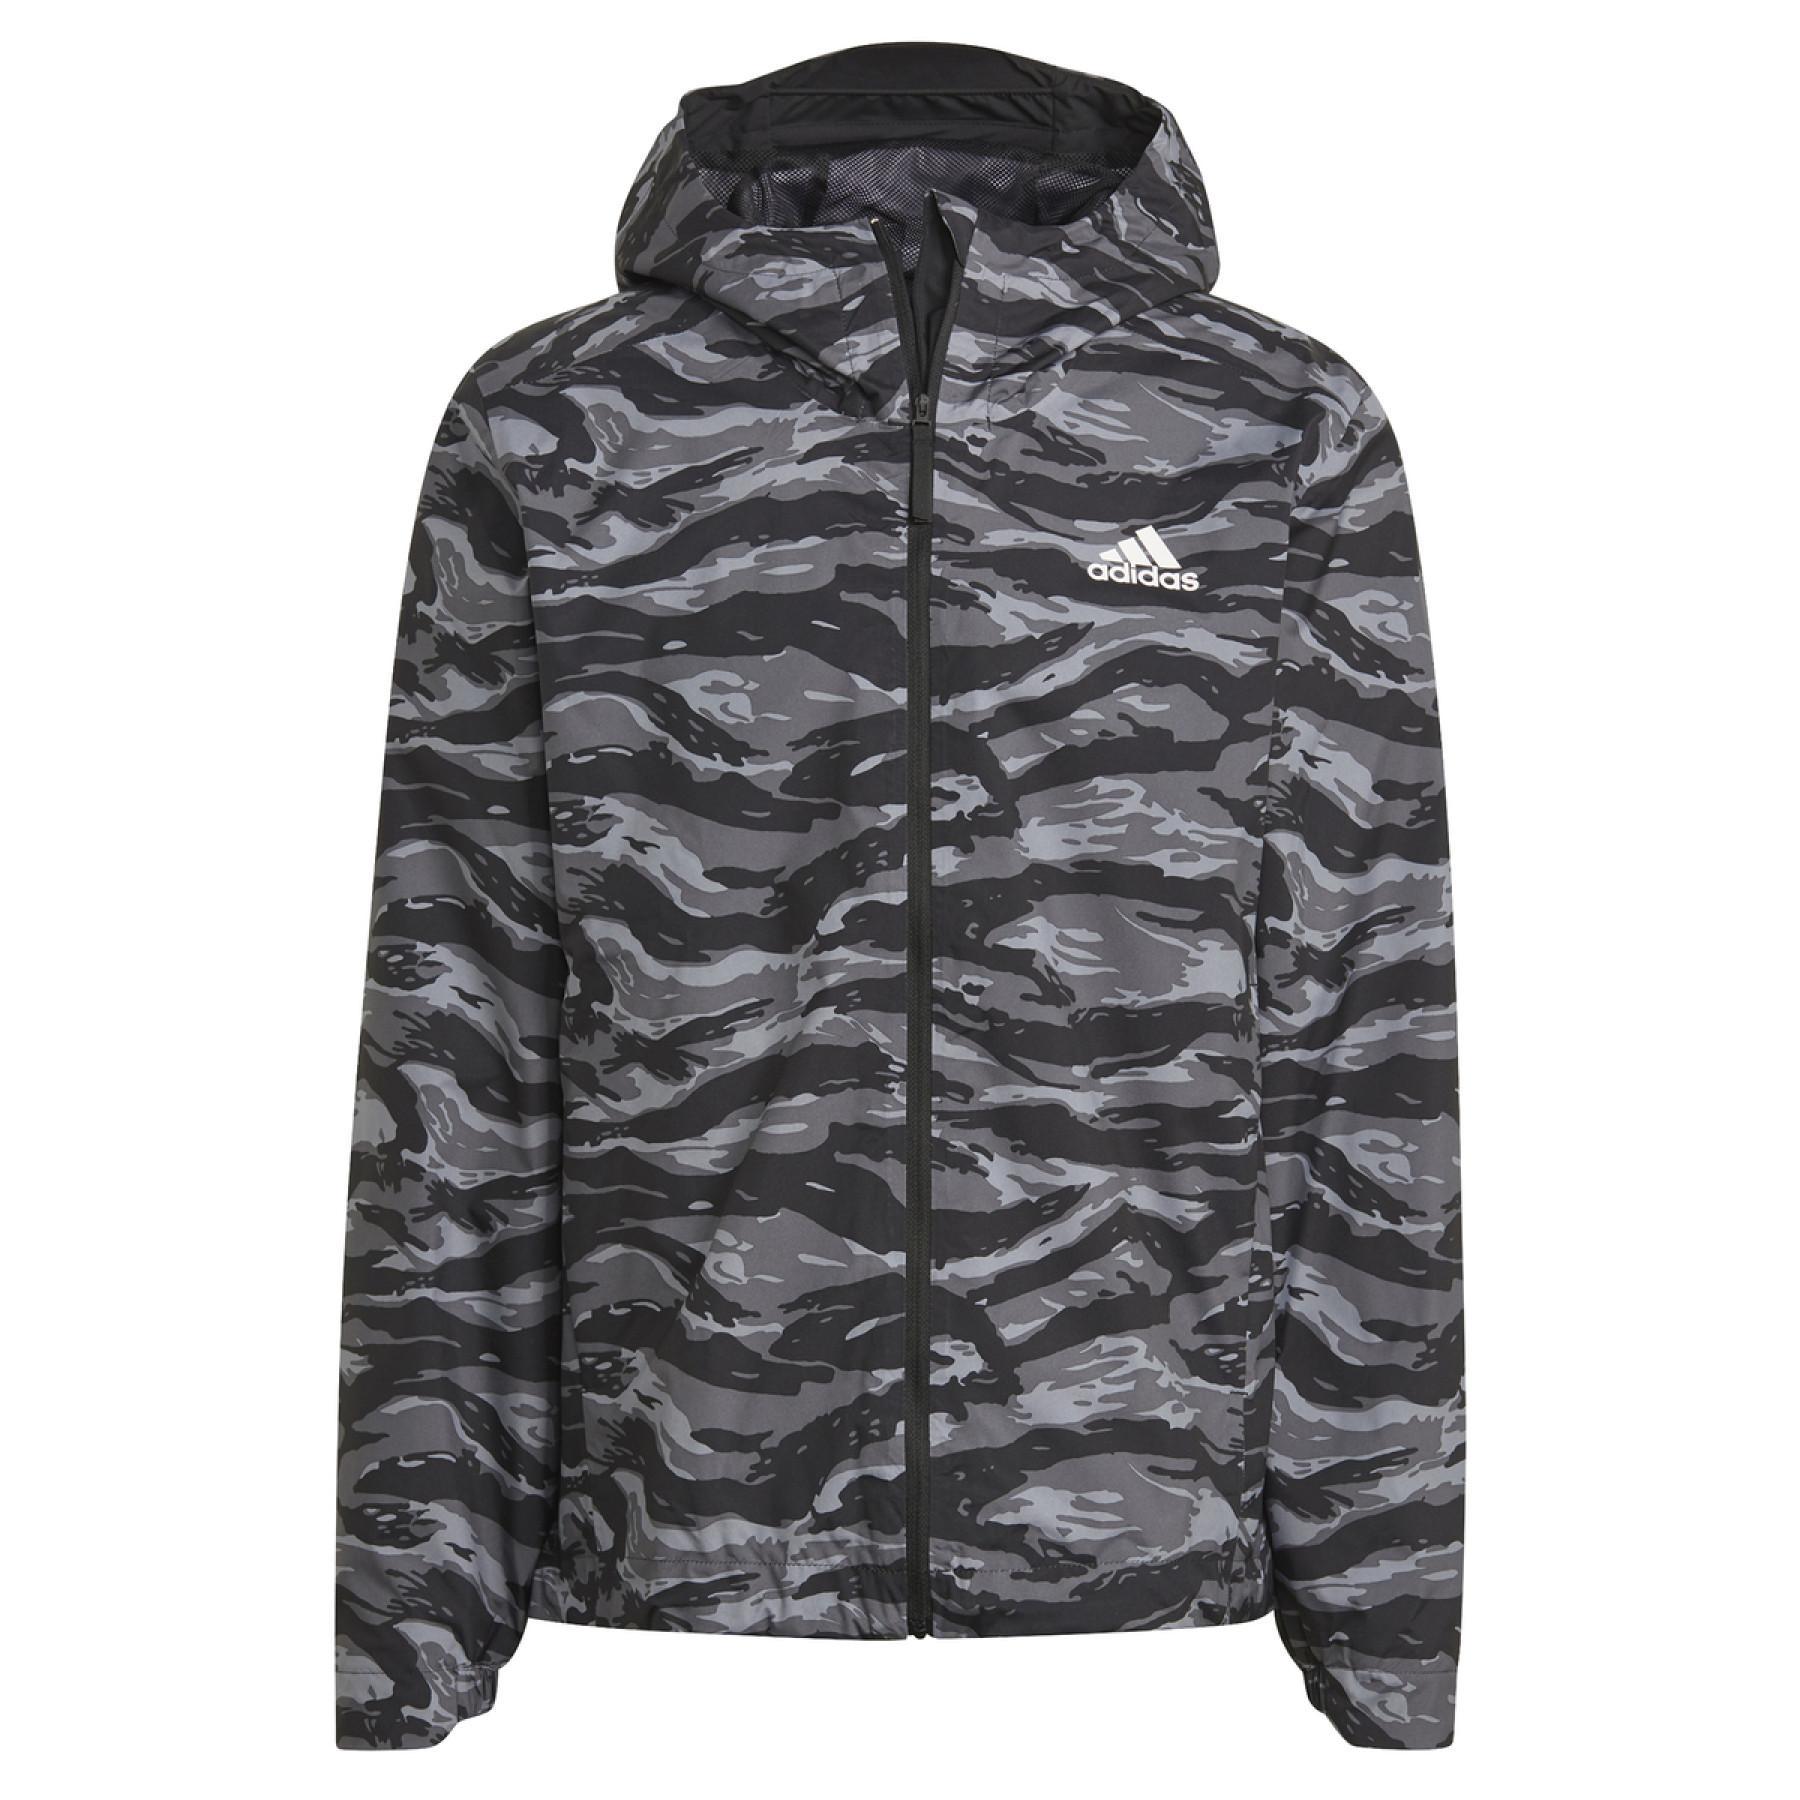 adidas BSC Rain Ready Jacket